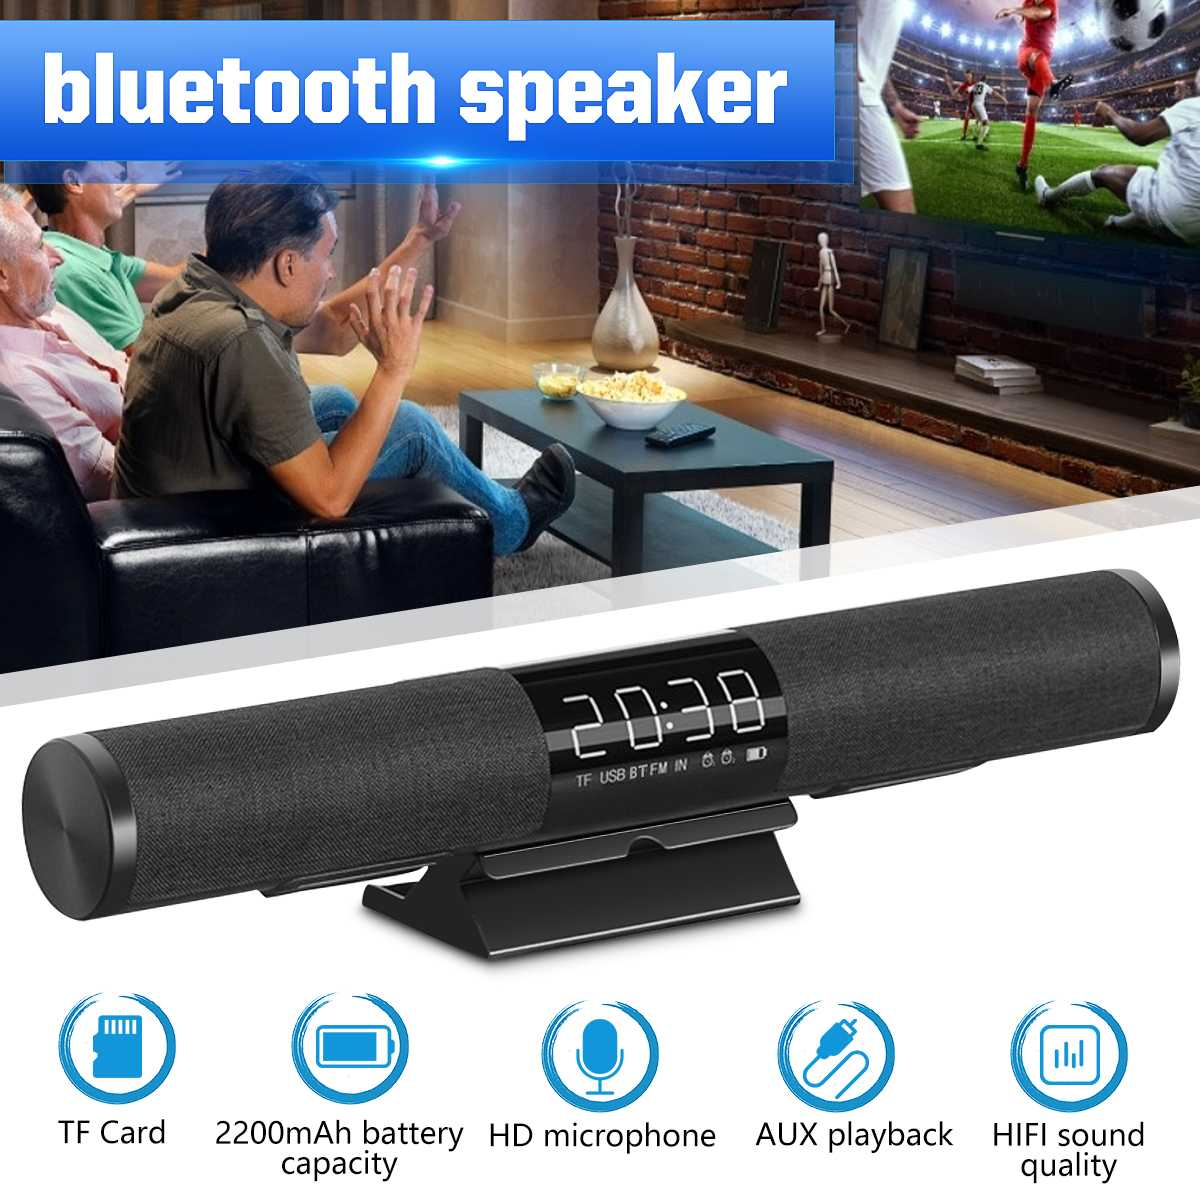 Altavoz portátil bluetooth Hi-Fi altavoz al aire libre inalámbrico TF AUX u-disk altavoz LED con micrófono 65Hz-18KHz manos libres